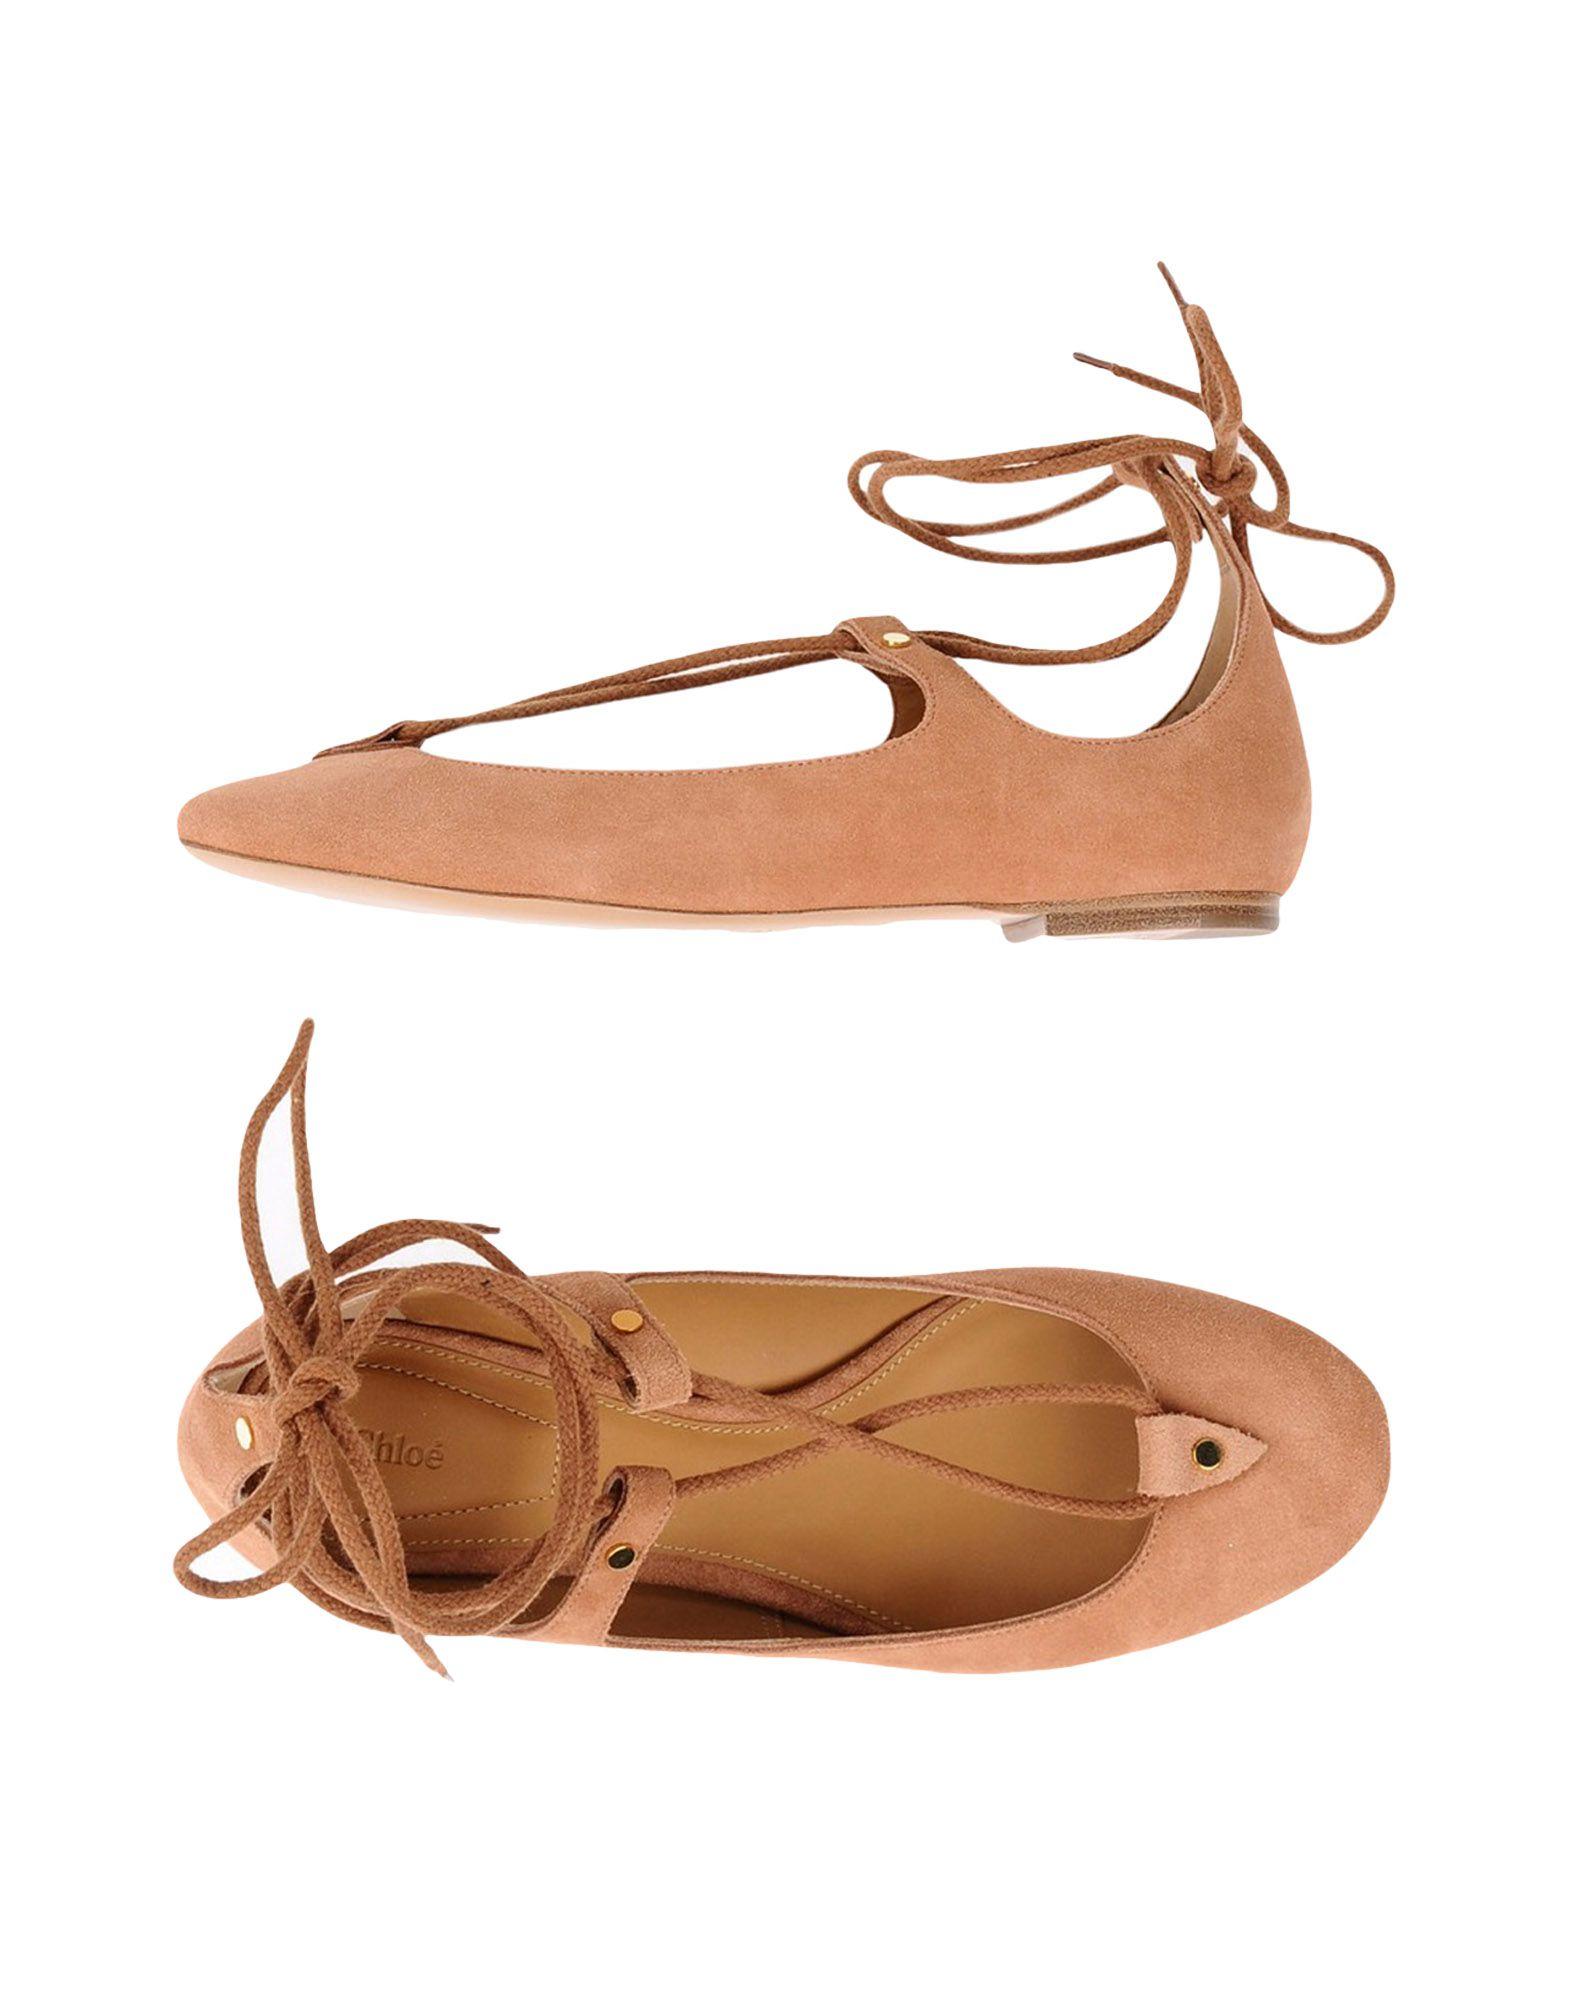 Rabatt Schuhe Chloé Ballerinas Damen  11245389FK